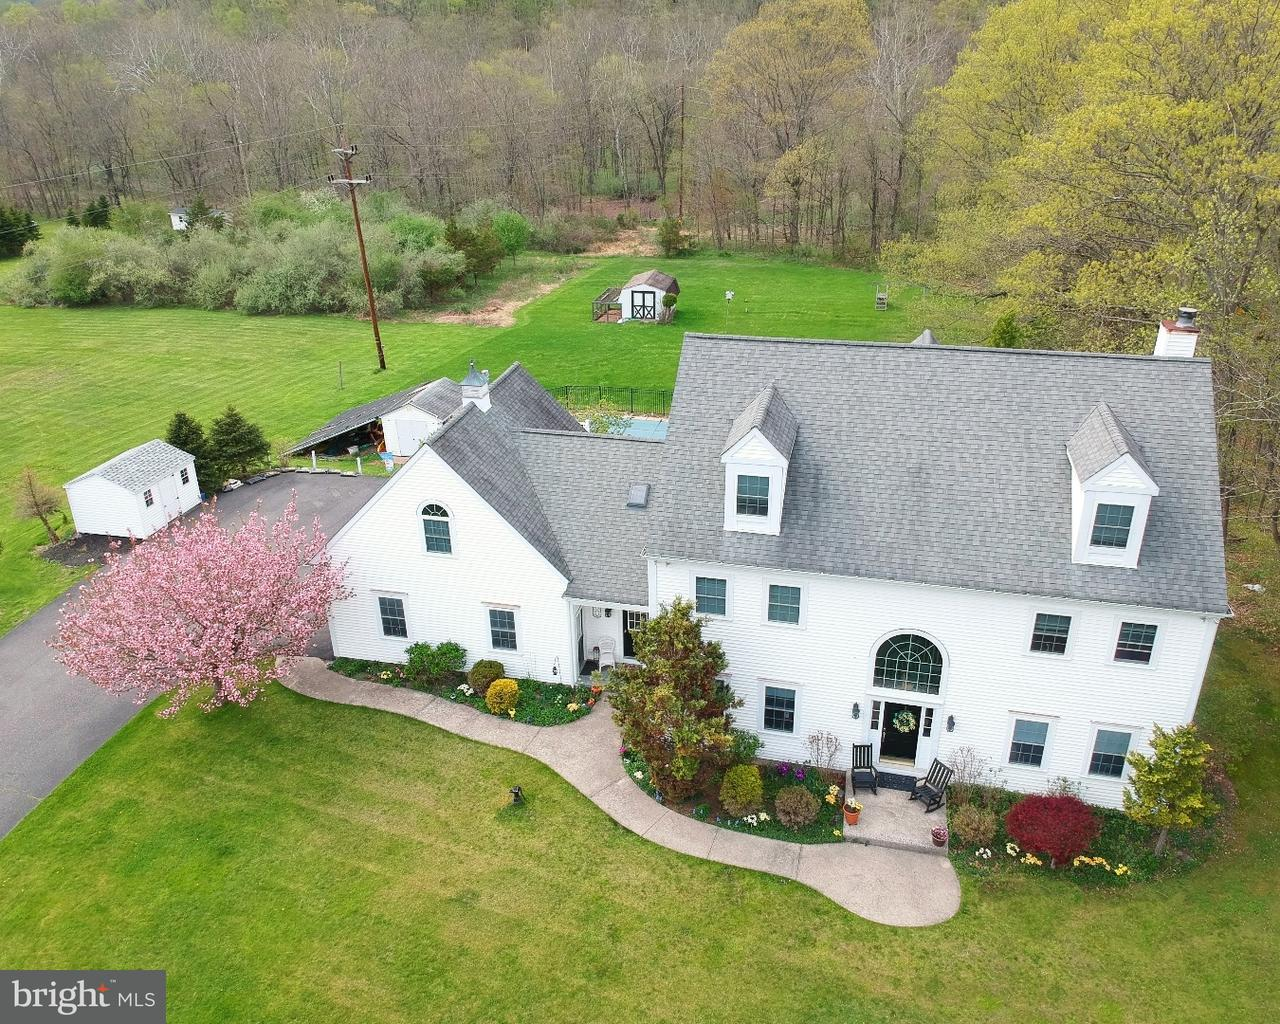 Single Family Home for Sale at 86 ALEXAUKEN CREEK Road Lambertville, New Jersey 08530 United StatesMunicipality: West Amwell Township